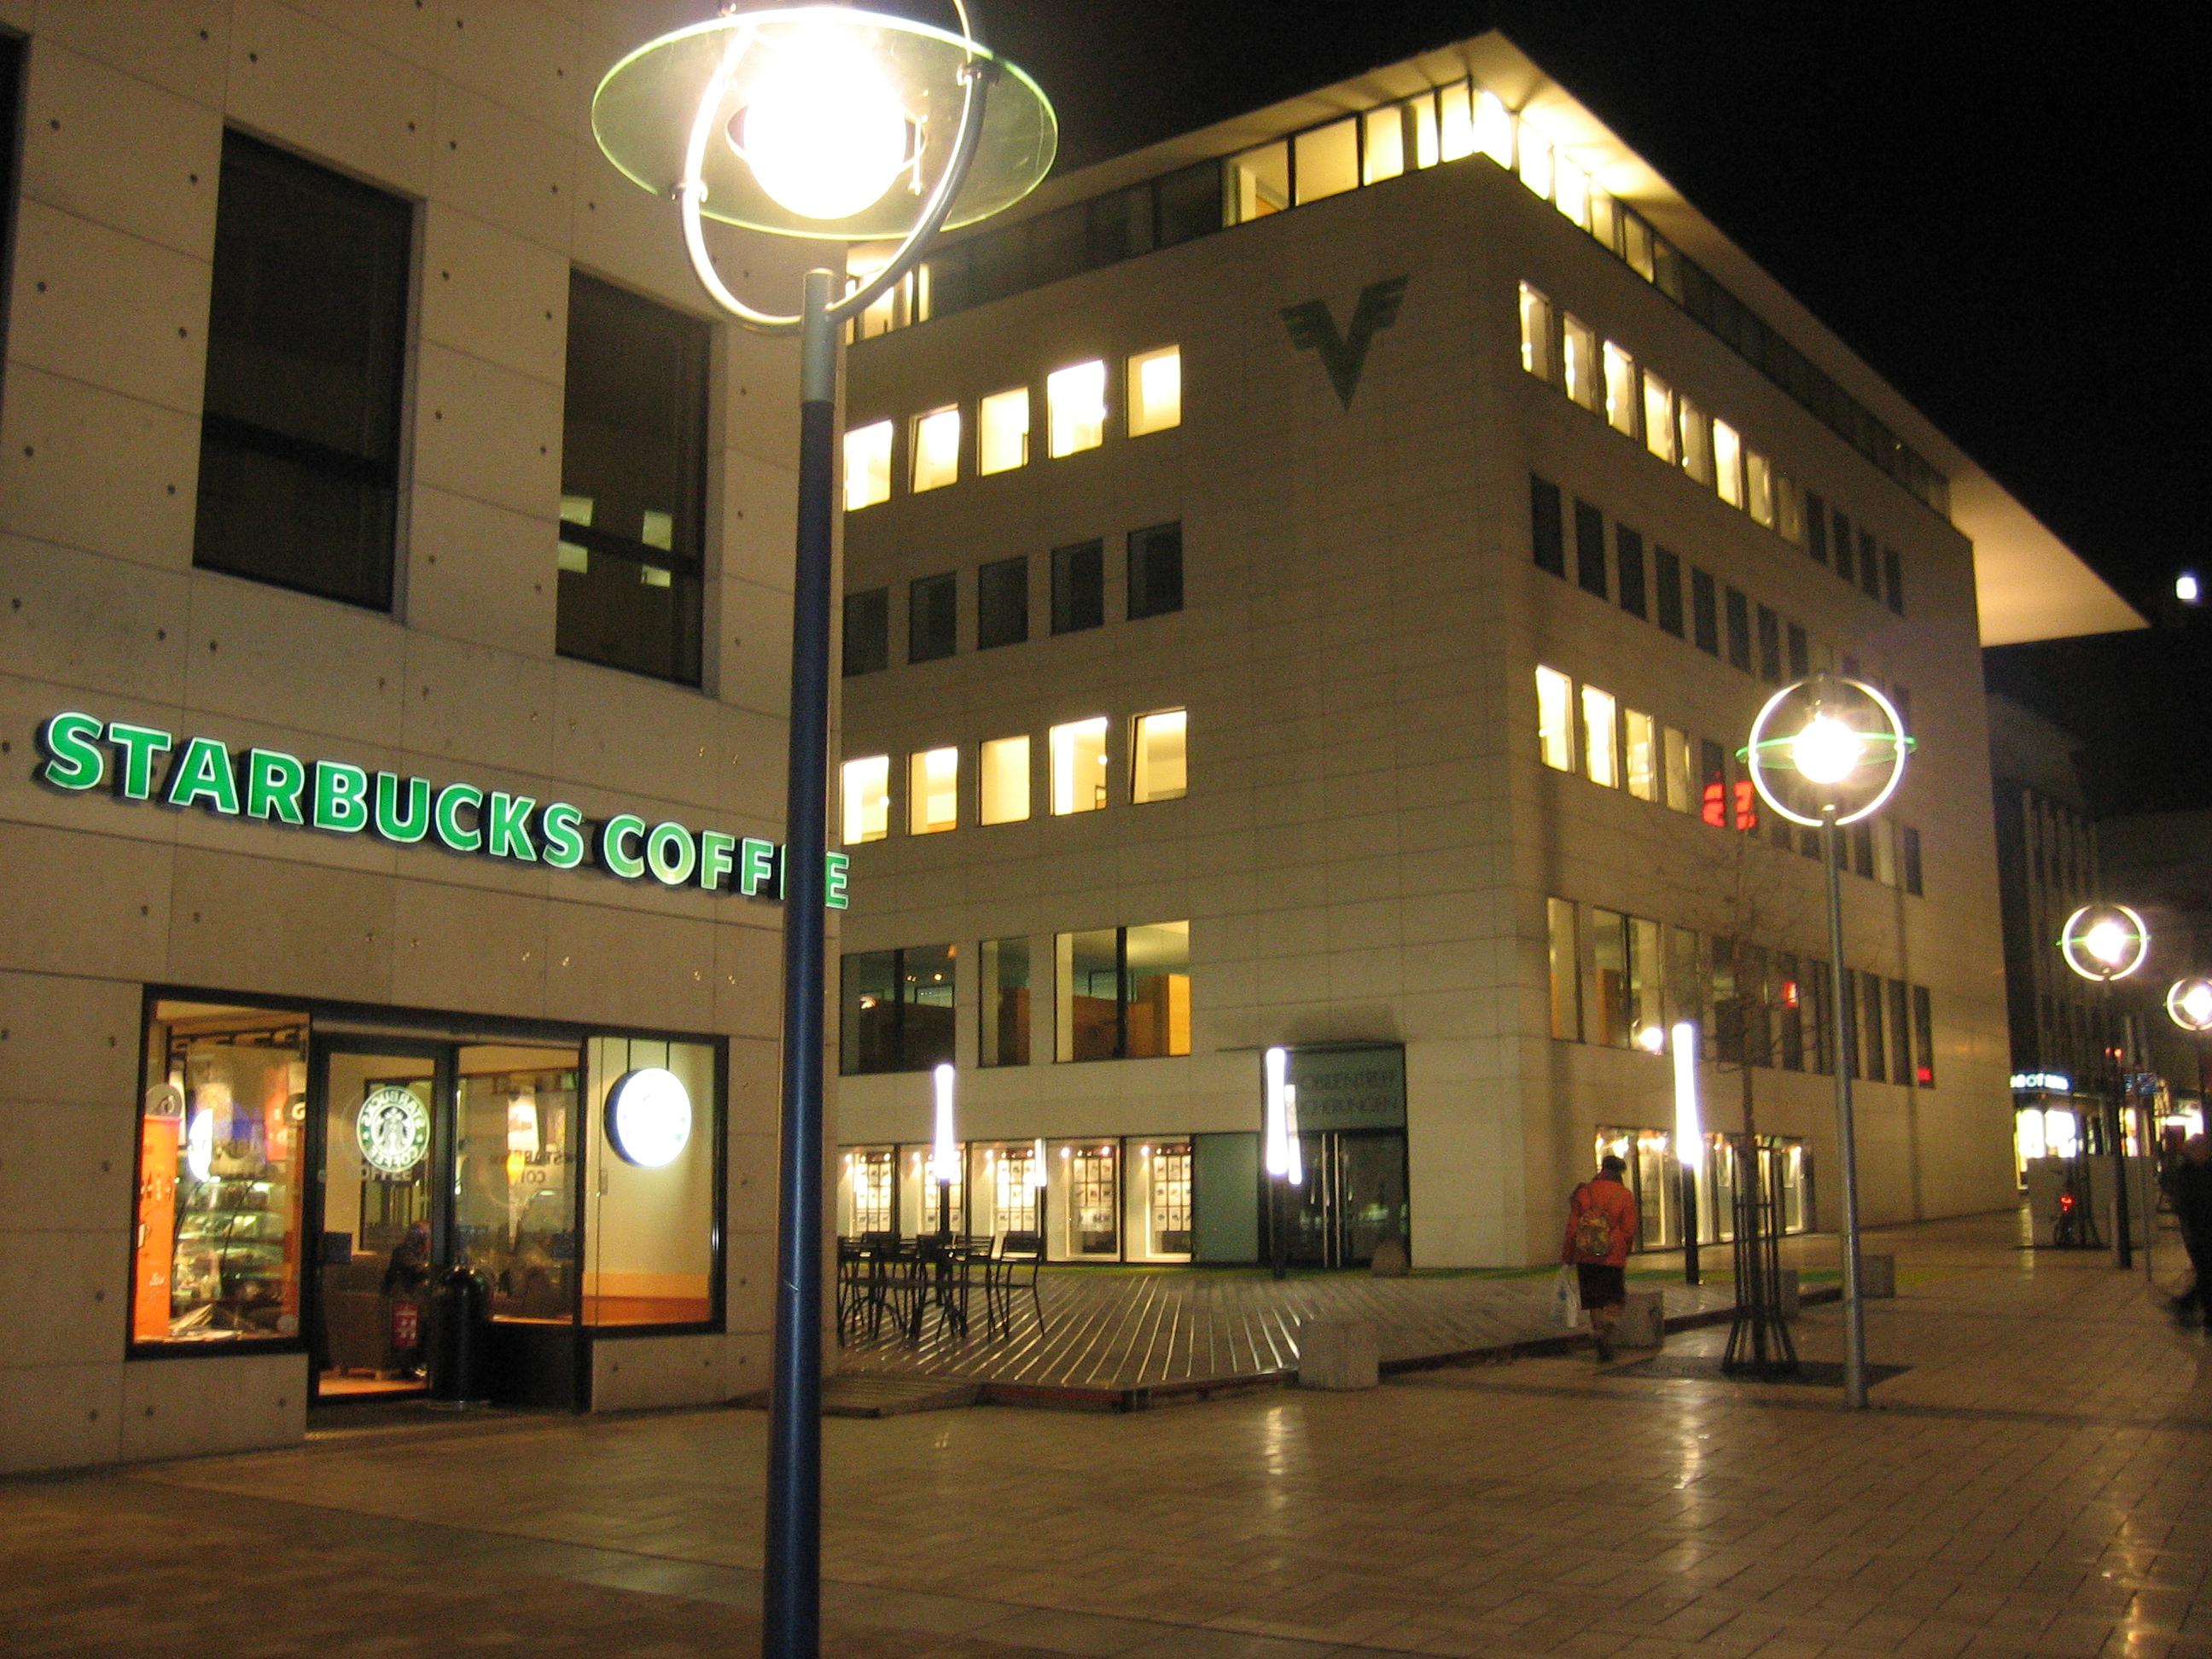 Starbucks in Dortmund, Germany